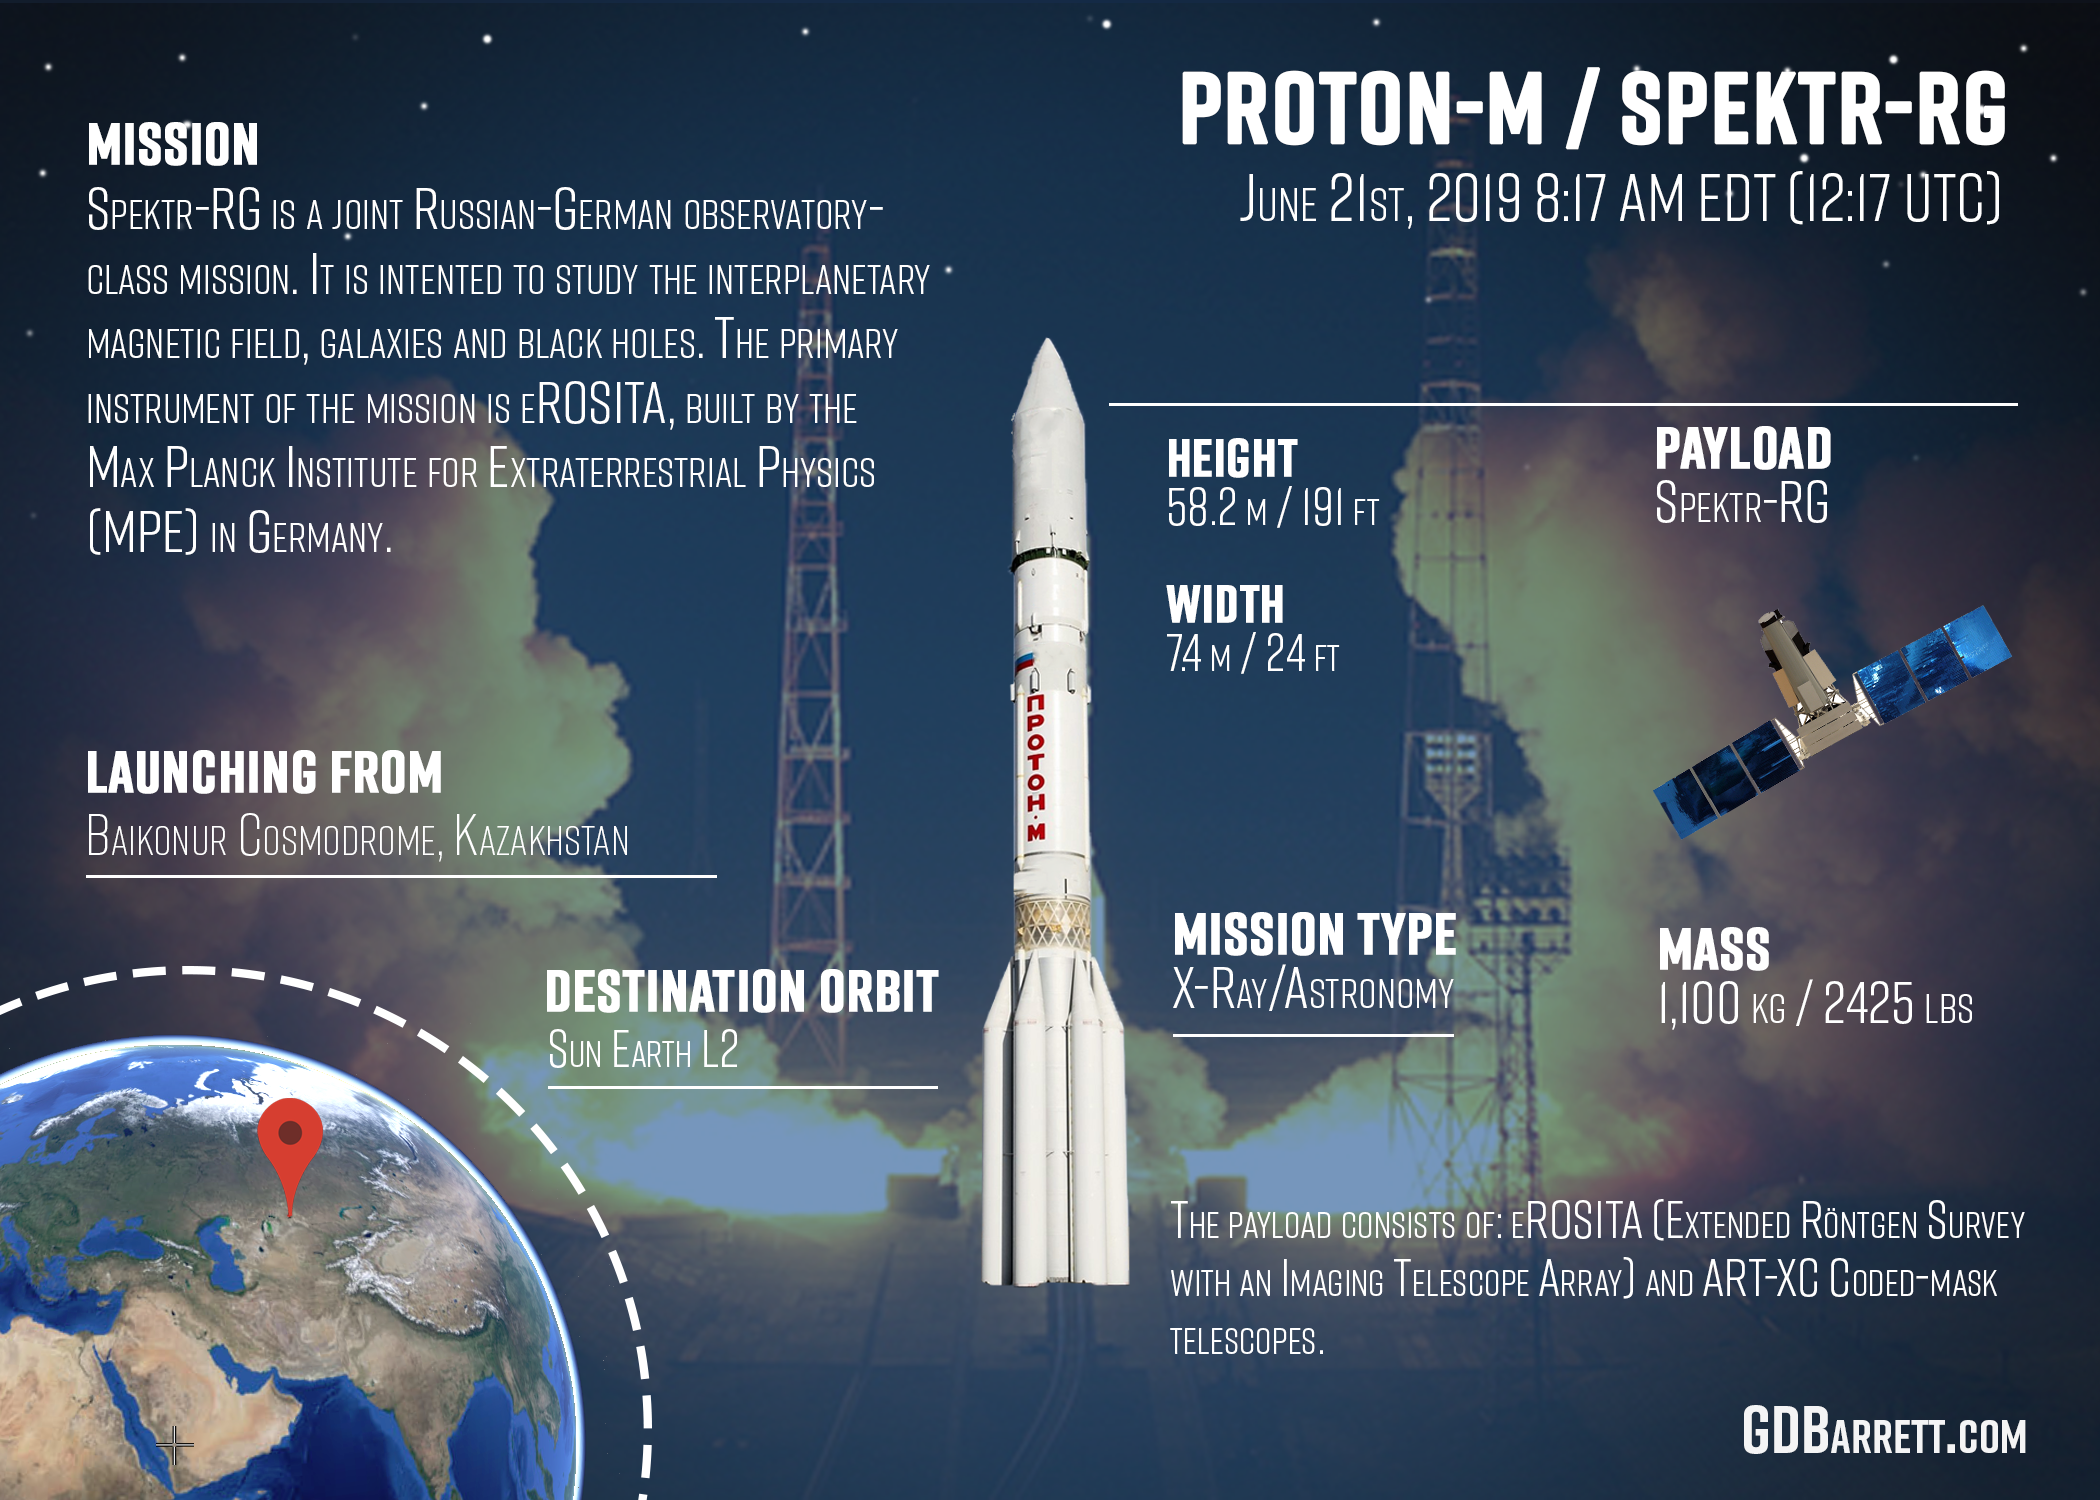 Proton-M / Spektr-RG